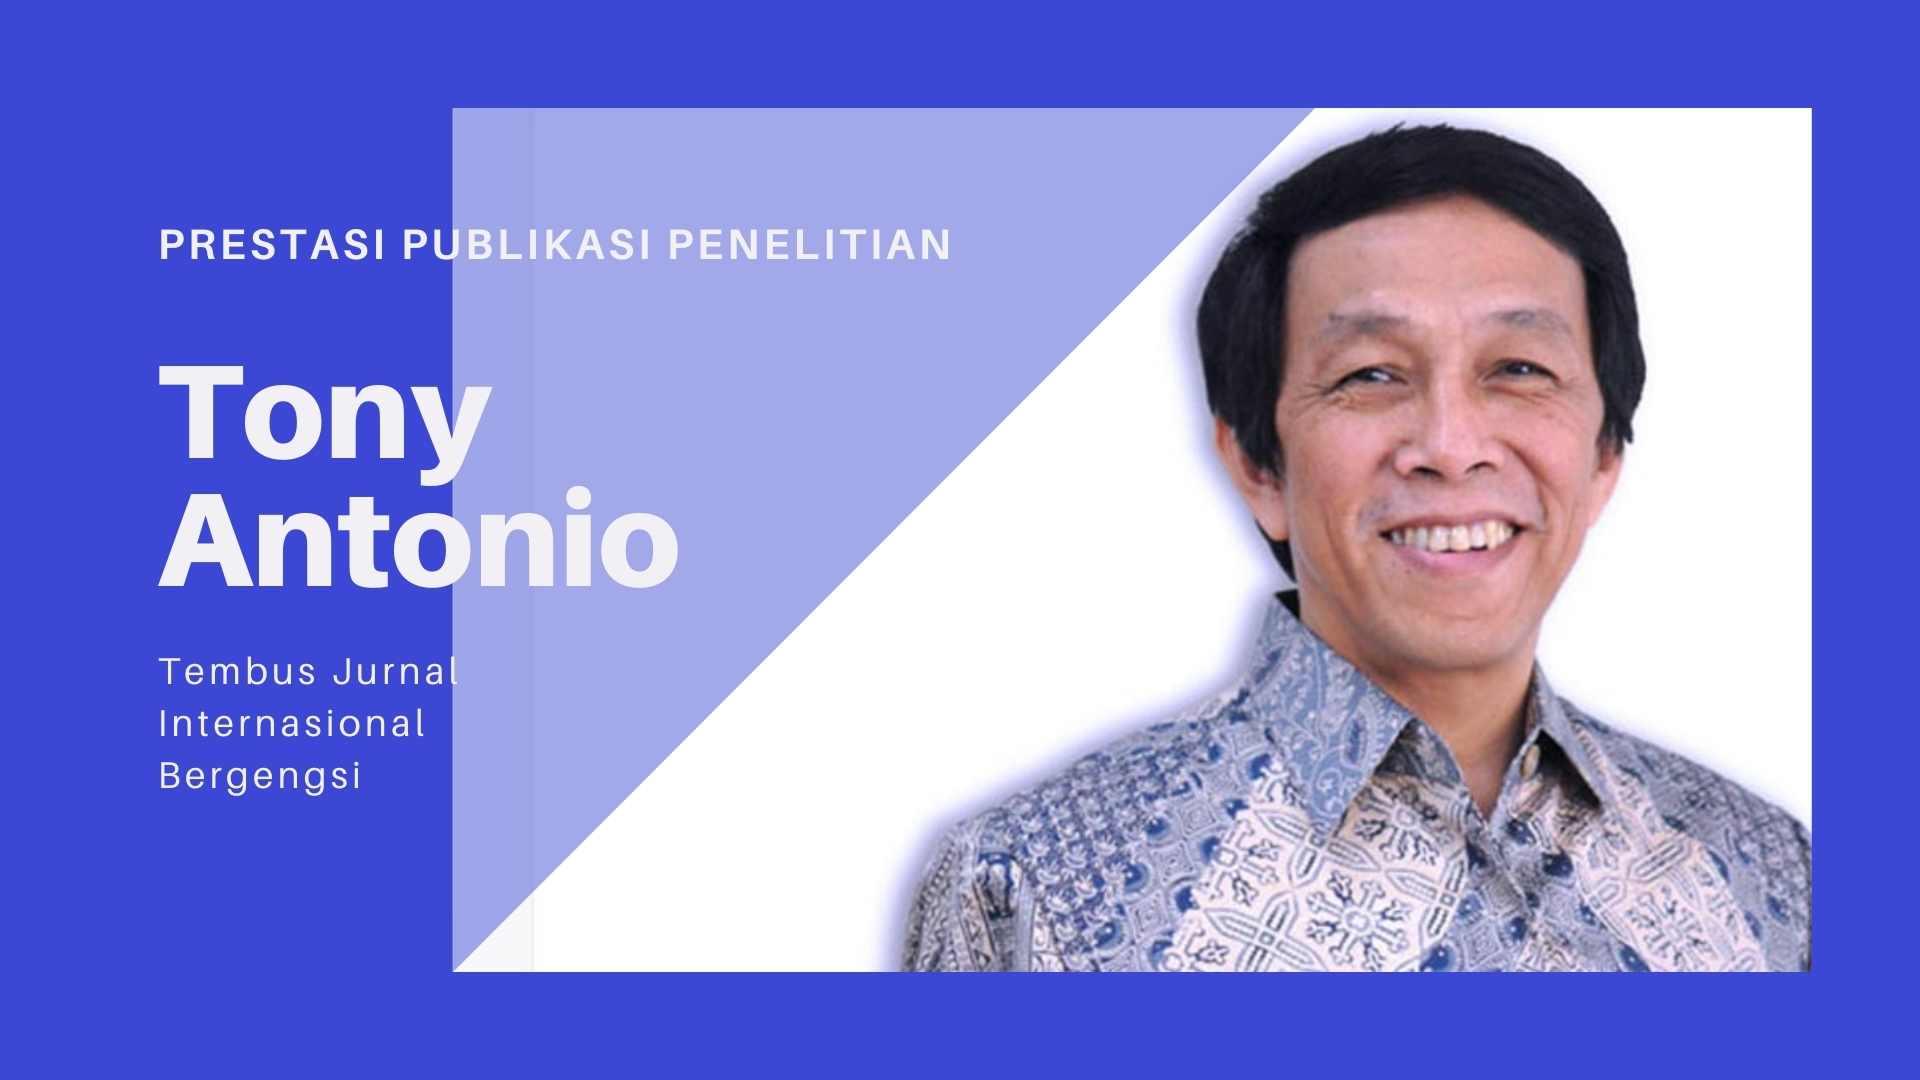 Hasil Riset Tony Antonio Universitas Ciputra Tembus Jurnal Internasional Bergengsi